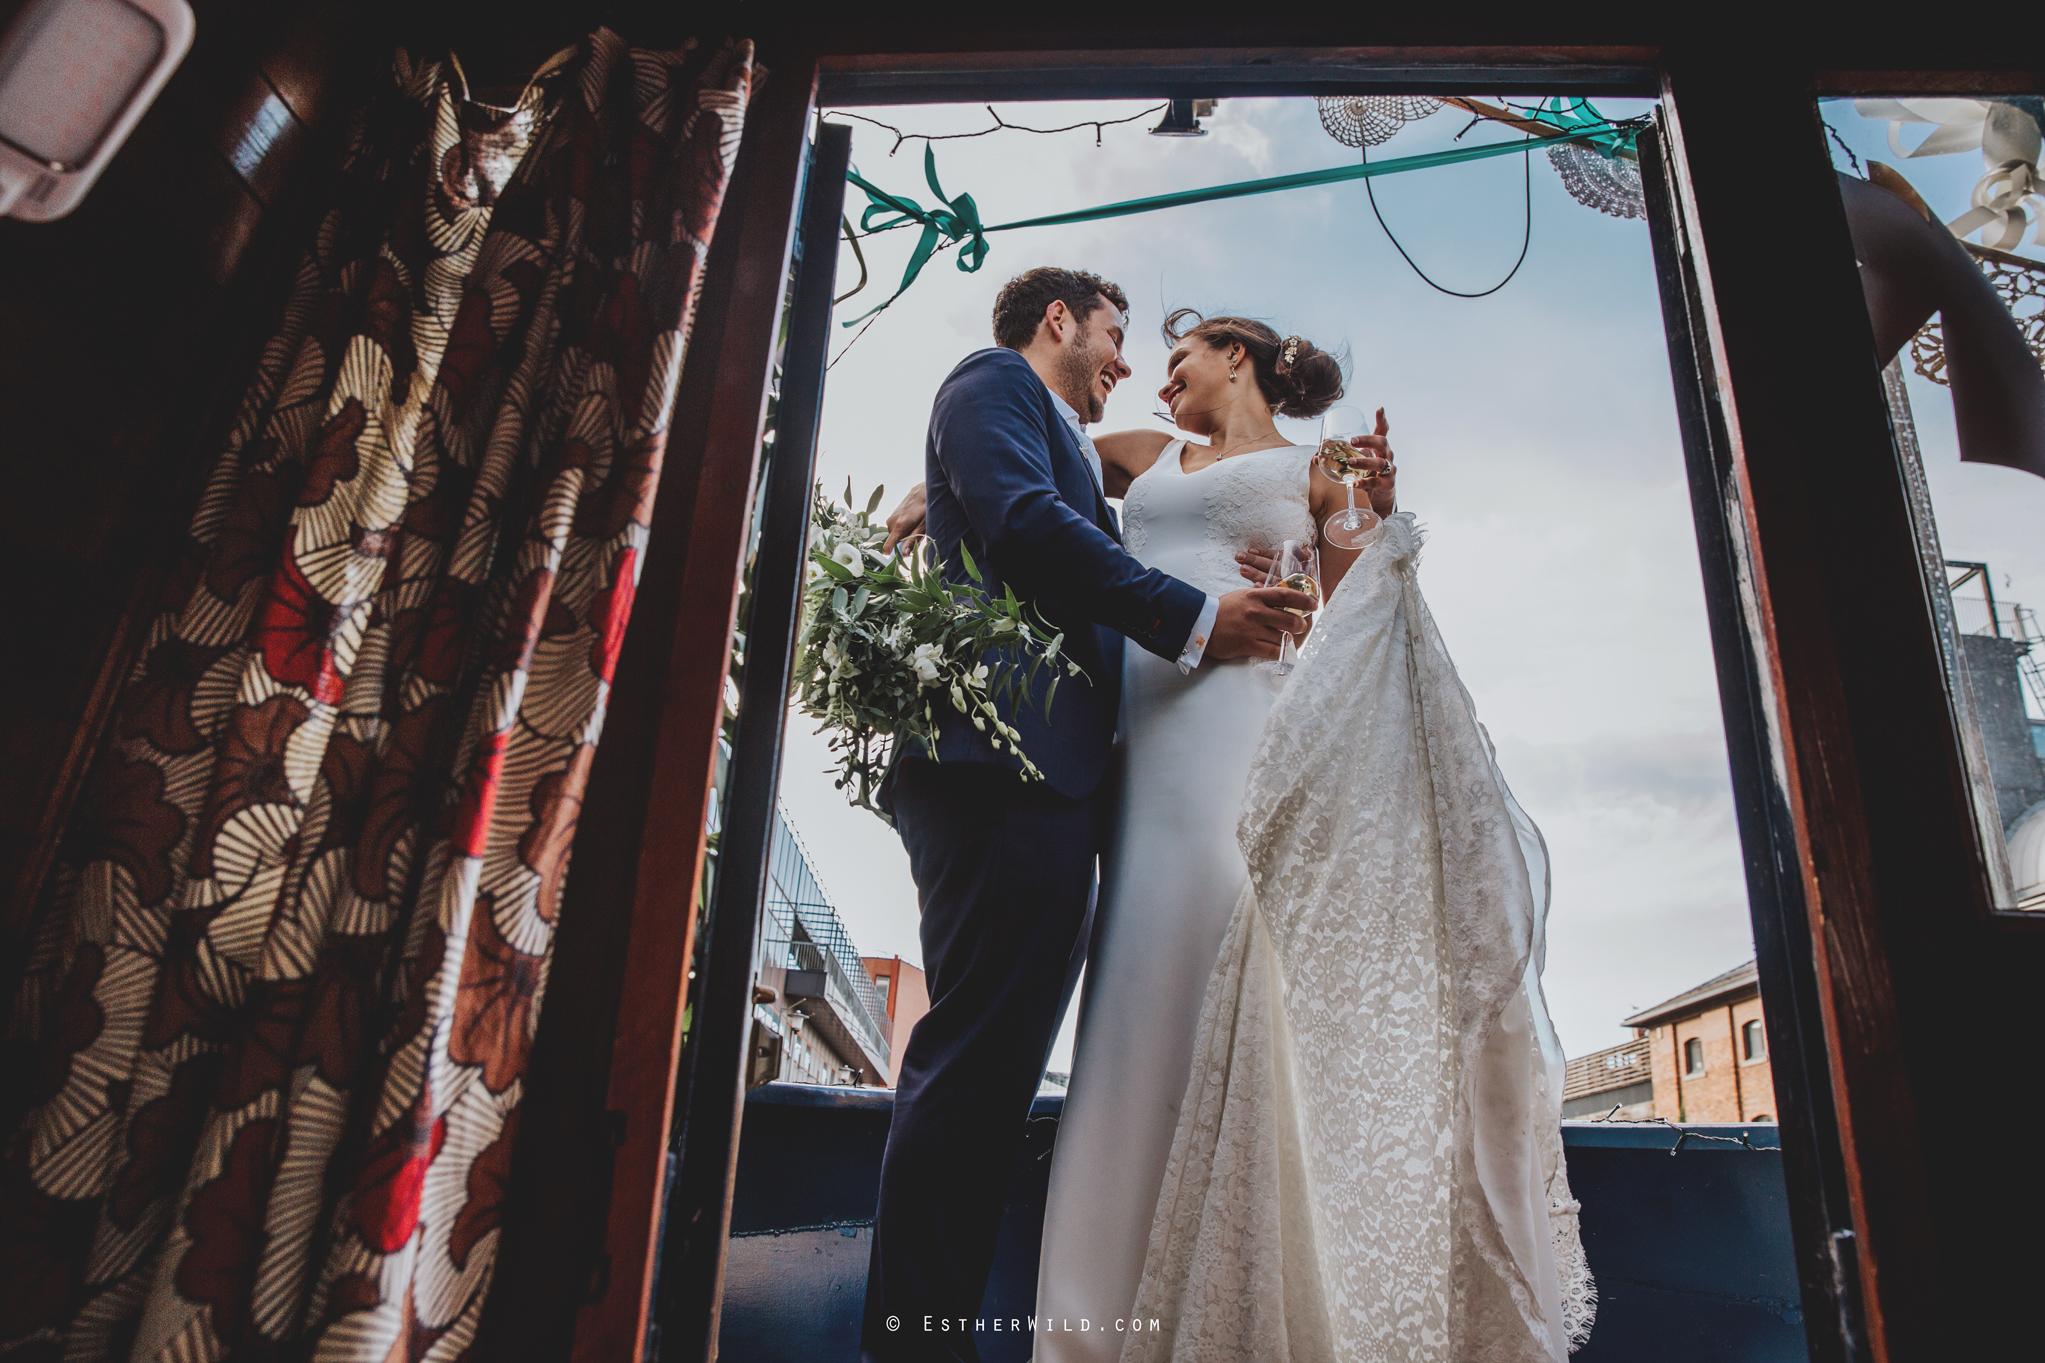 0917_London_Camden_Islington_Bus_Vintage_Wedding_Esther_Wild_IMG_6951-2.jpg